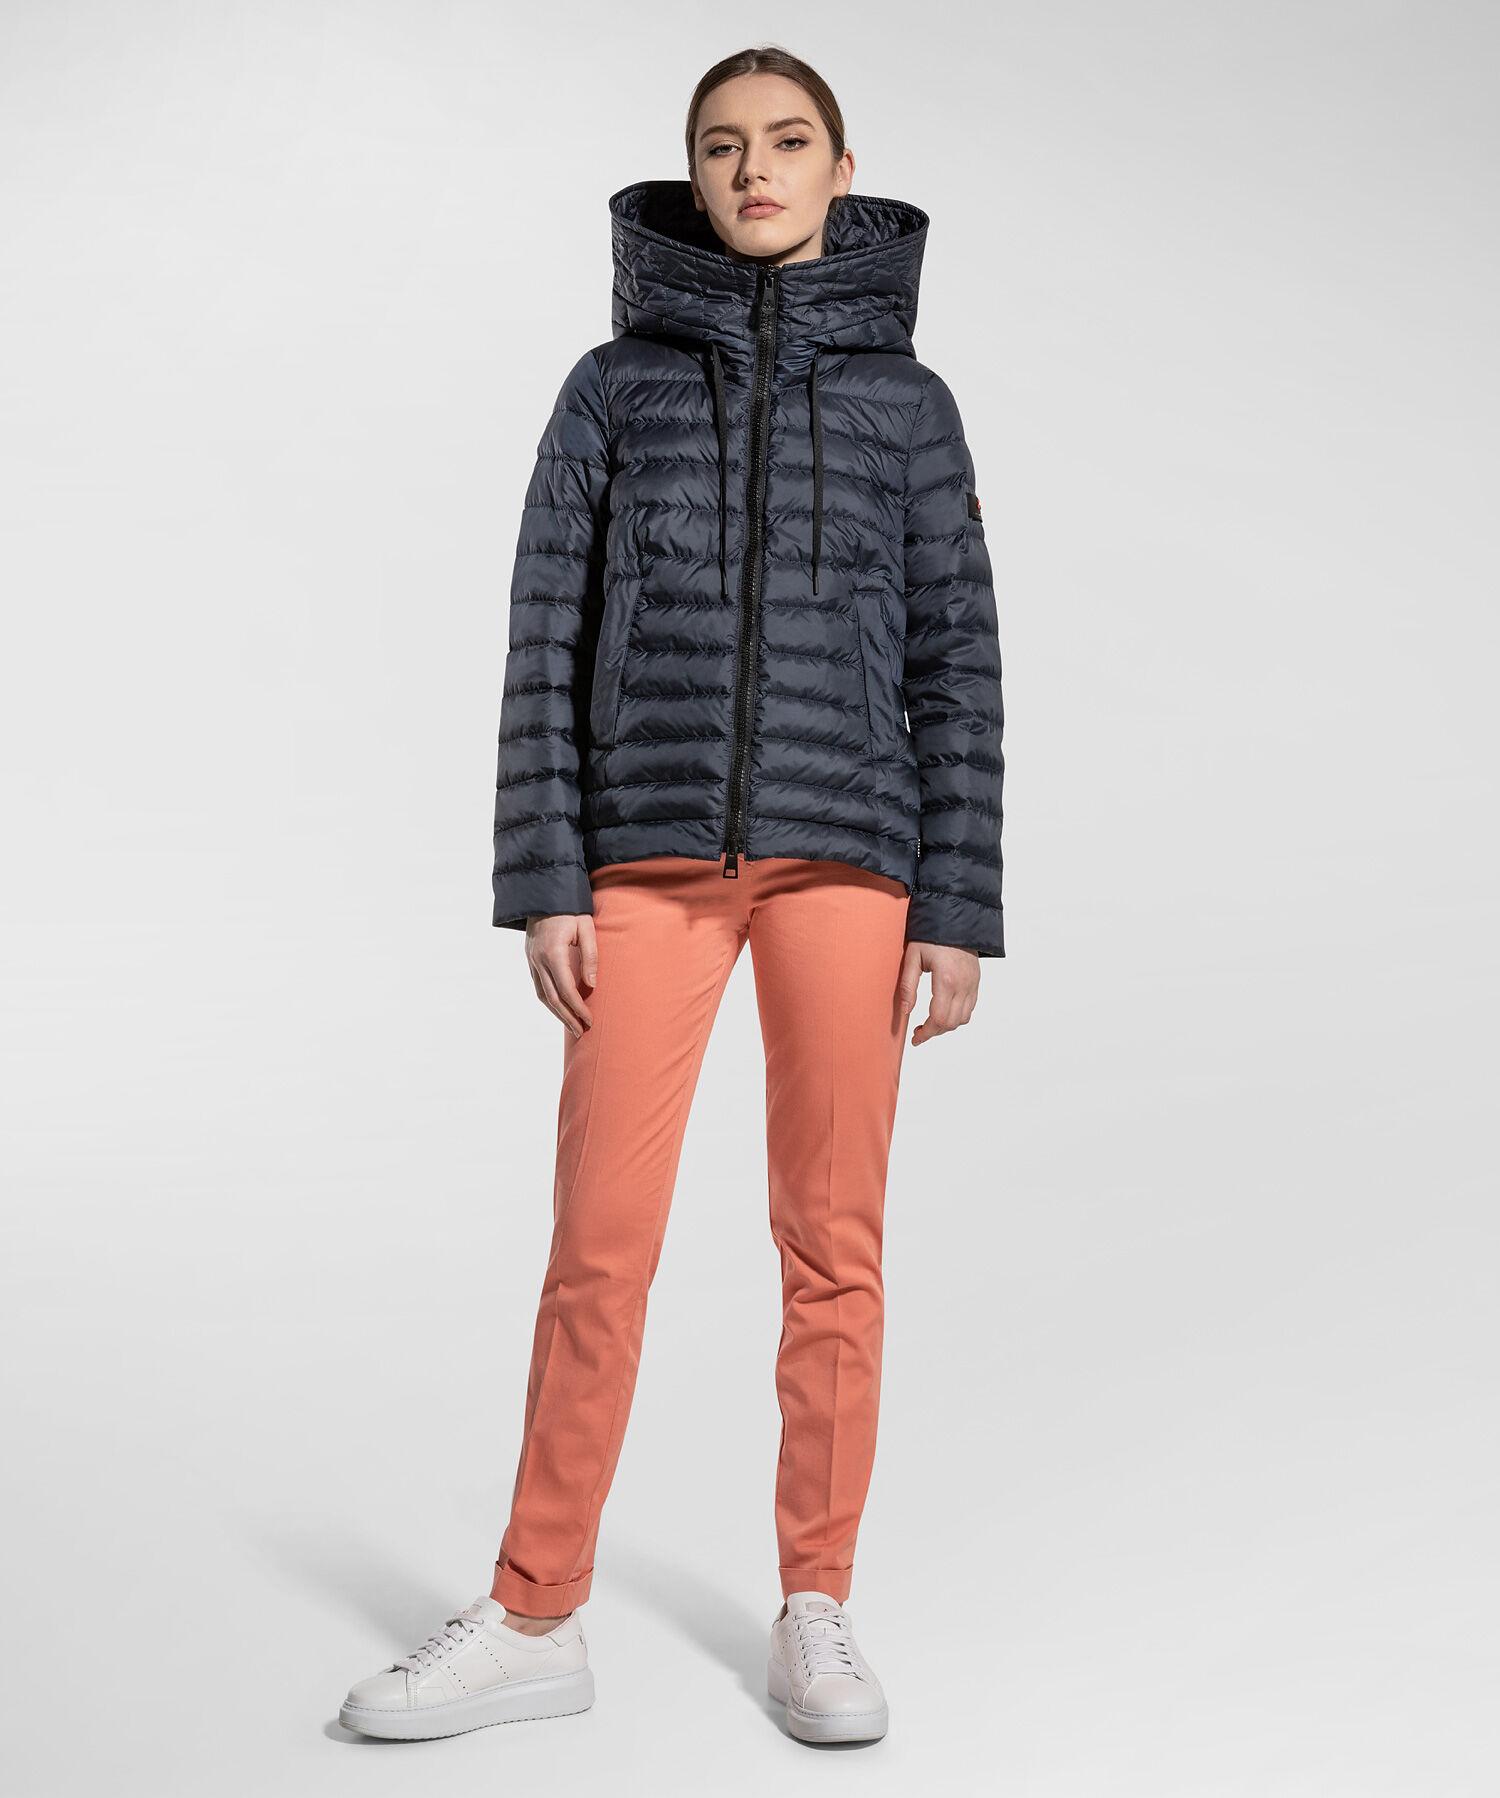 Piumino Regular Con Zip In Contrasto Colore - Peuterey